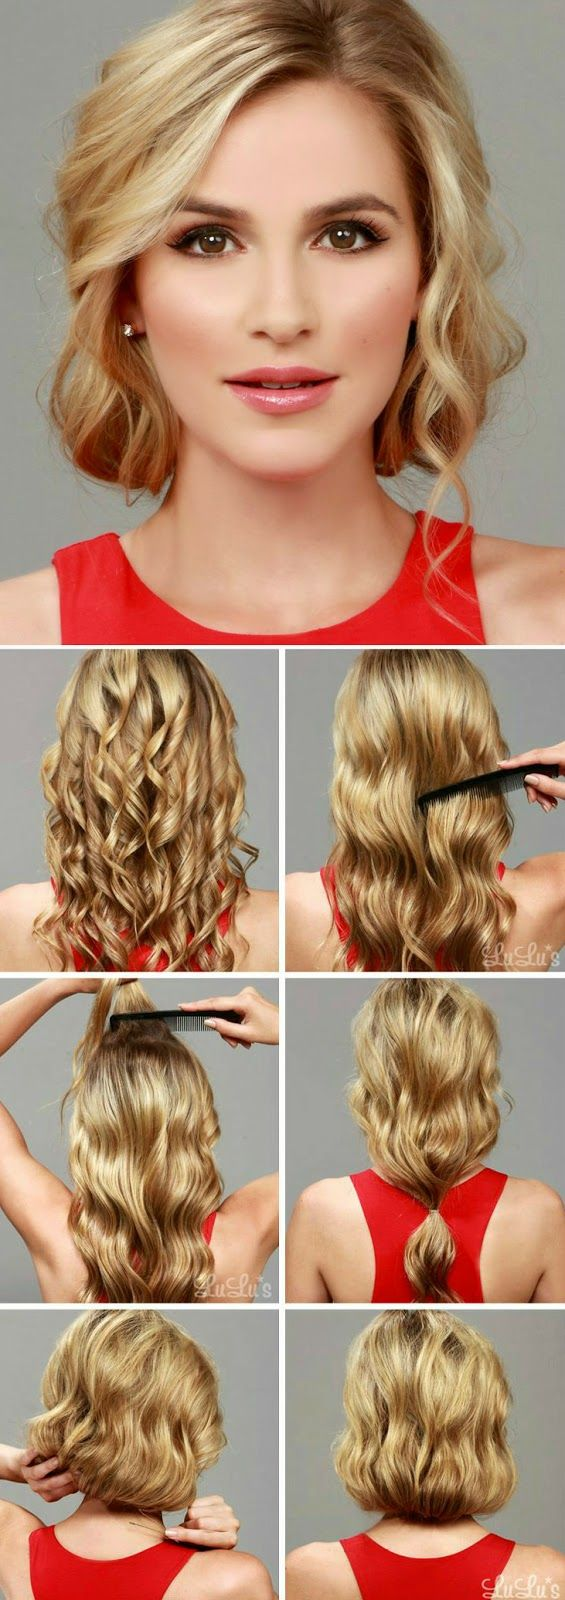 Lange Haare Lange Haare 20er Jahre Frisur Haar Styling